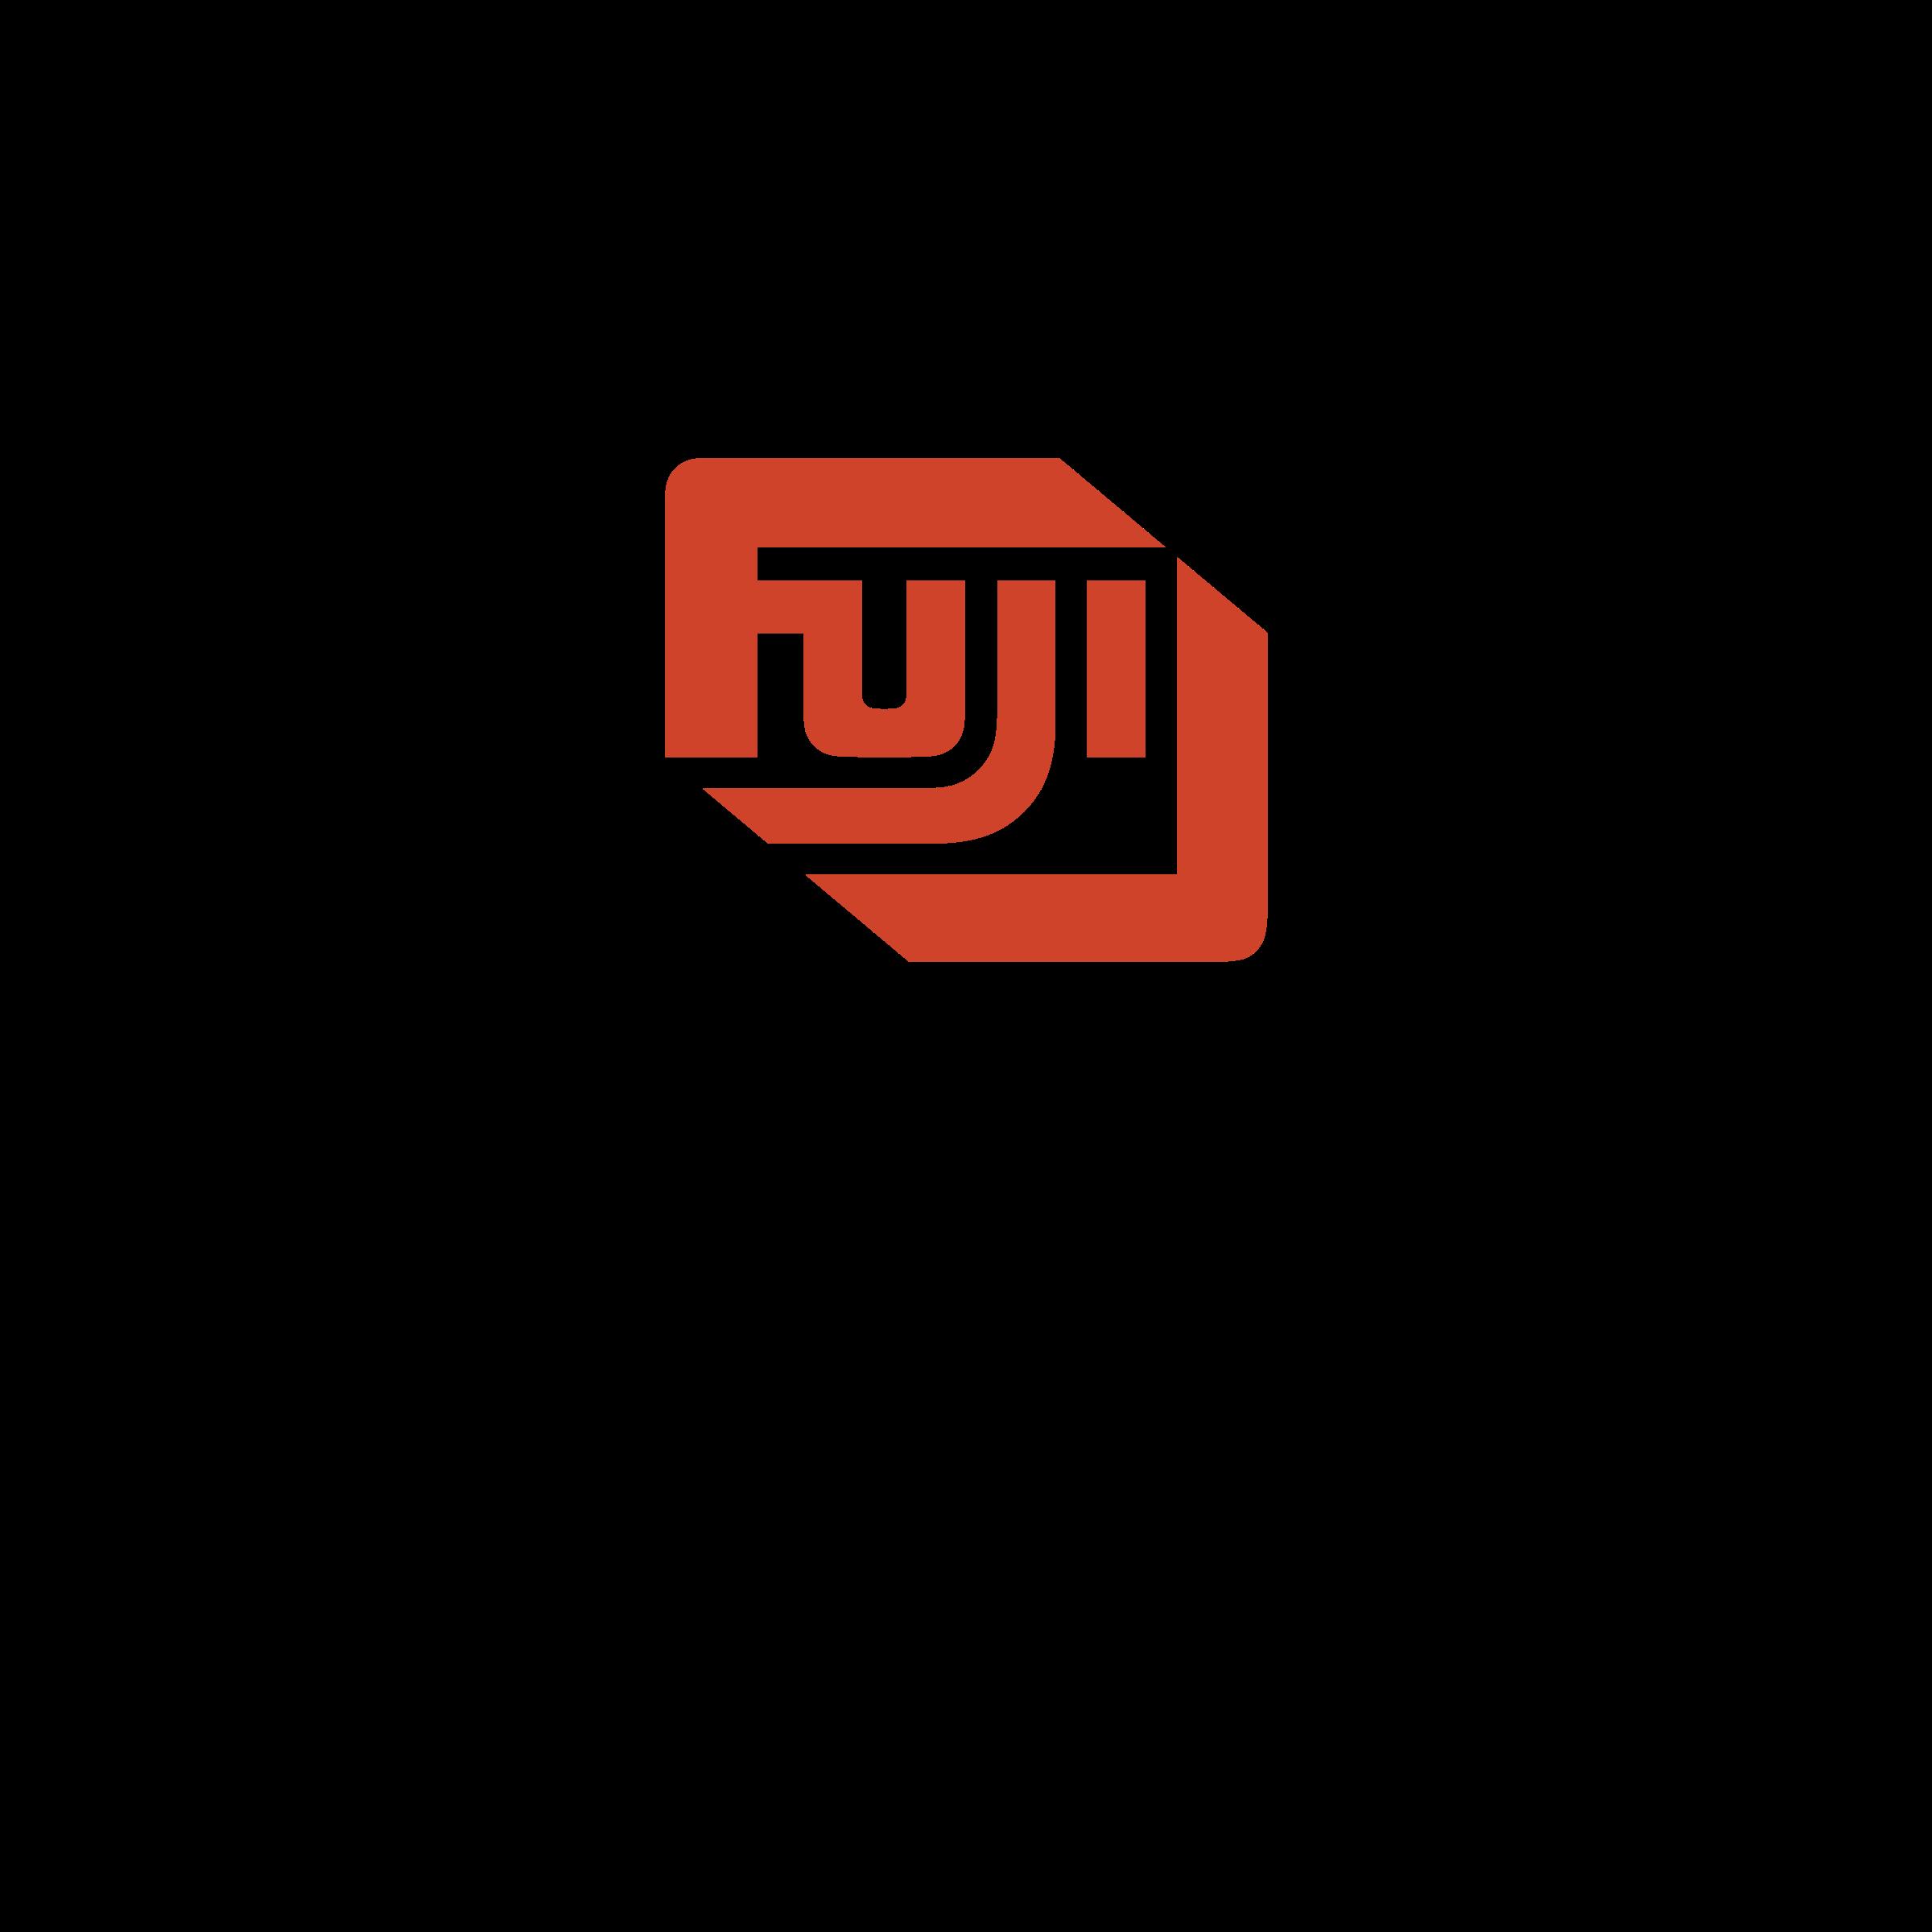 fujifilm-logo-png-transparent.png